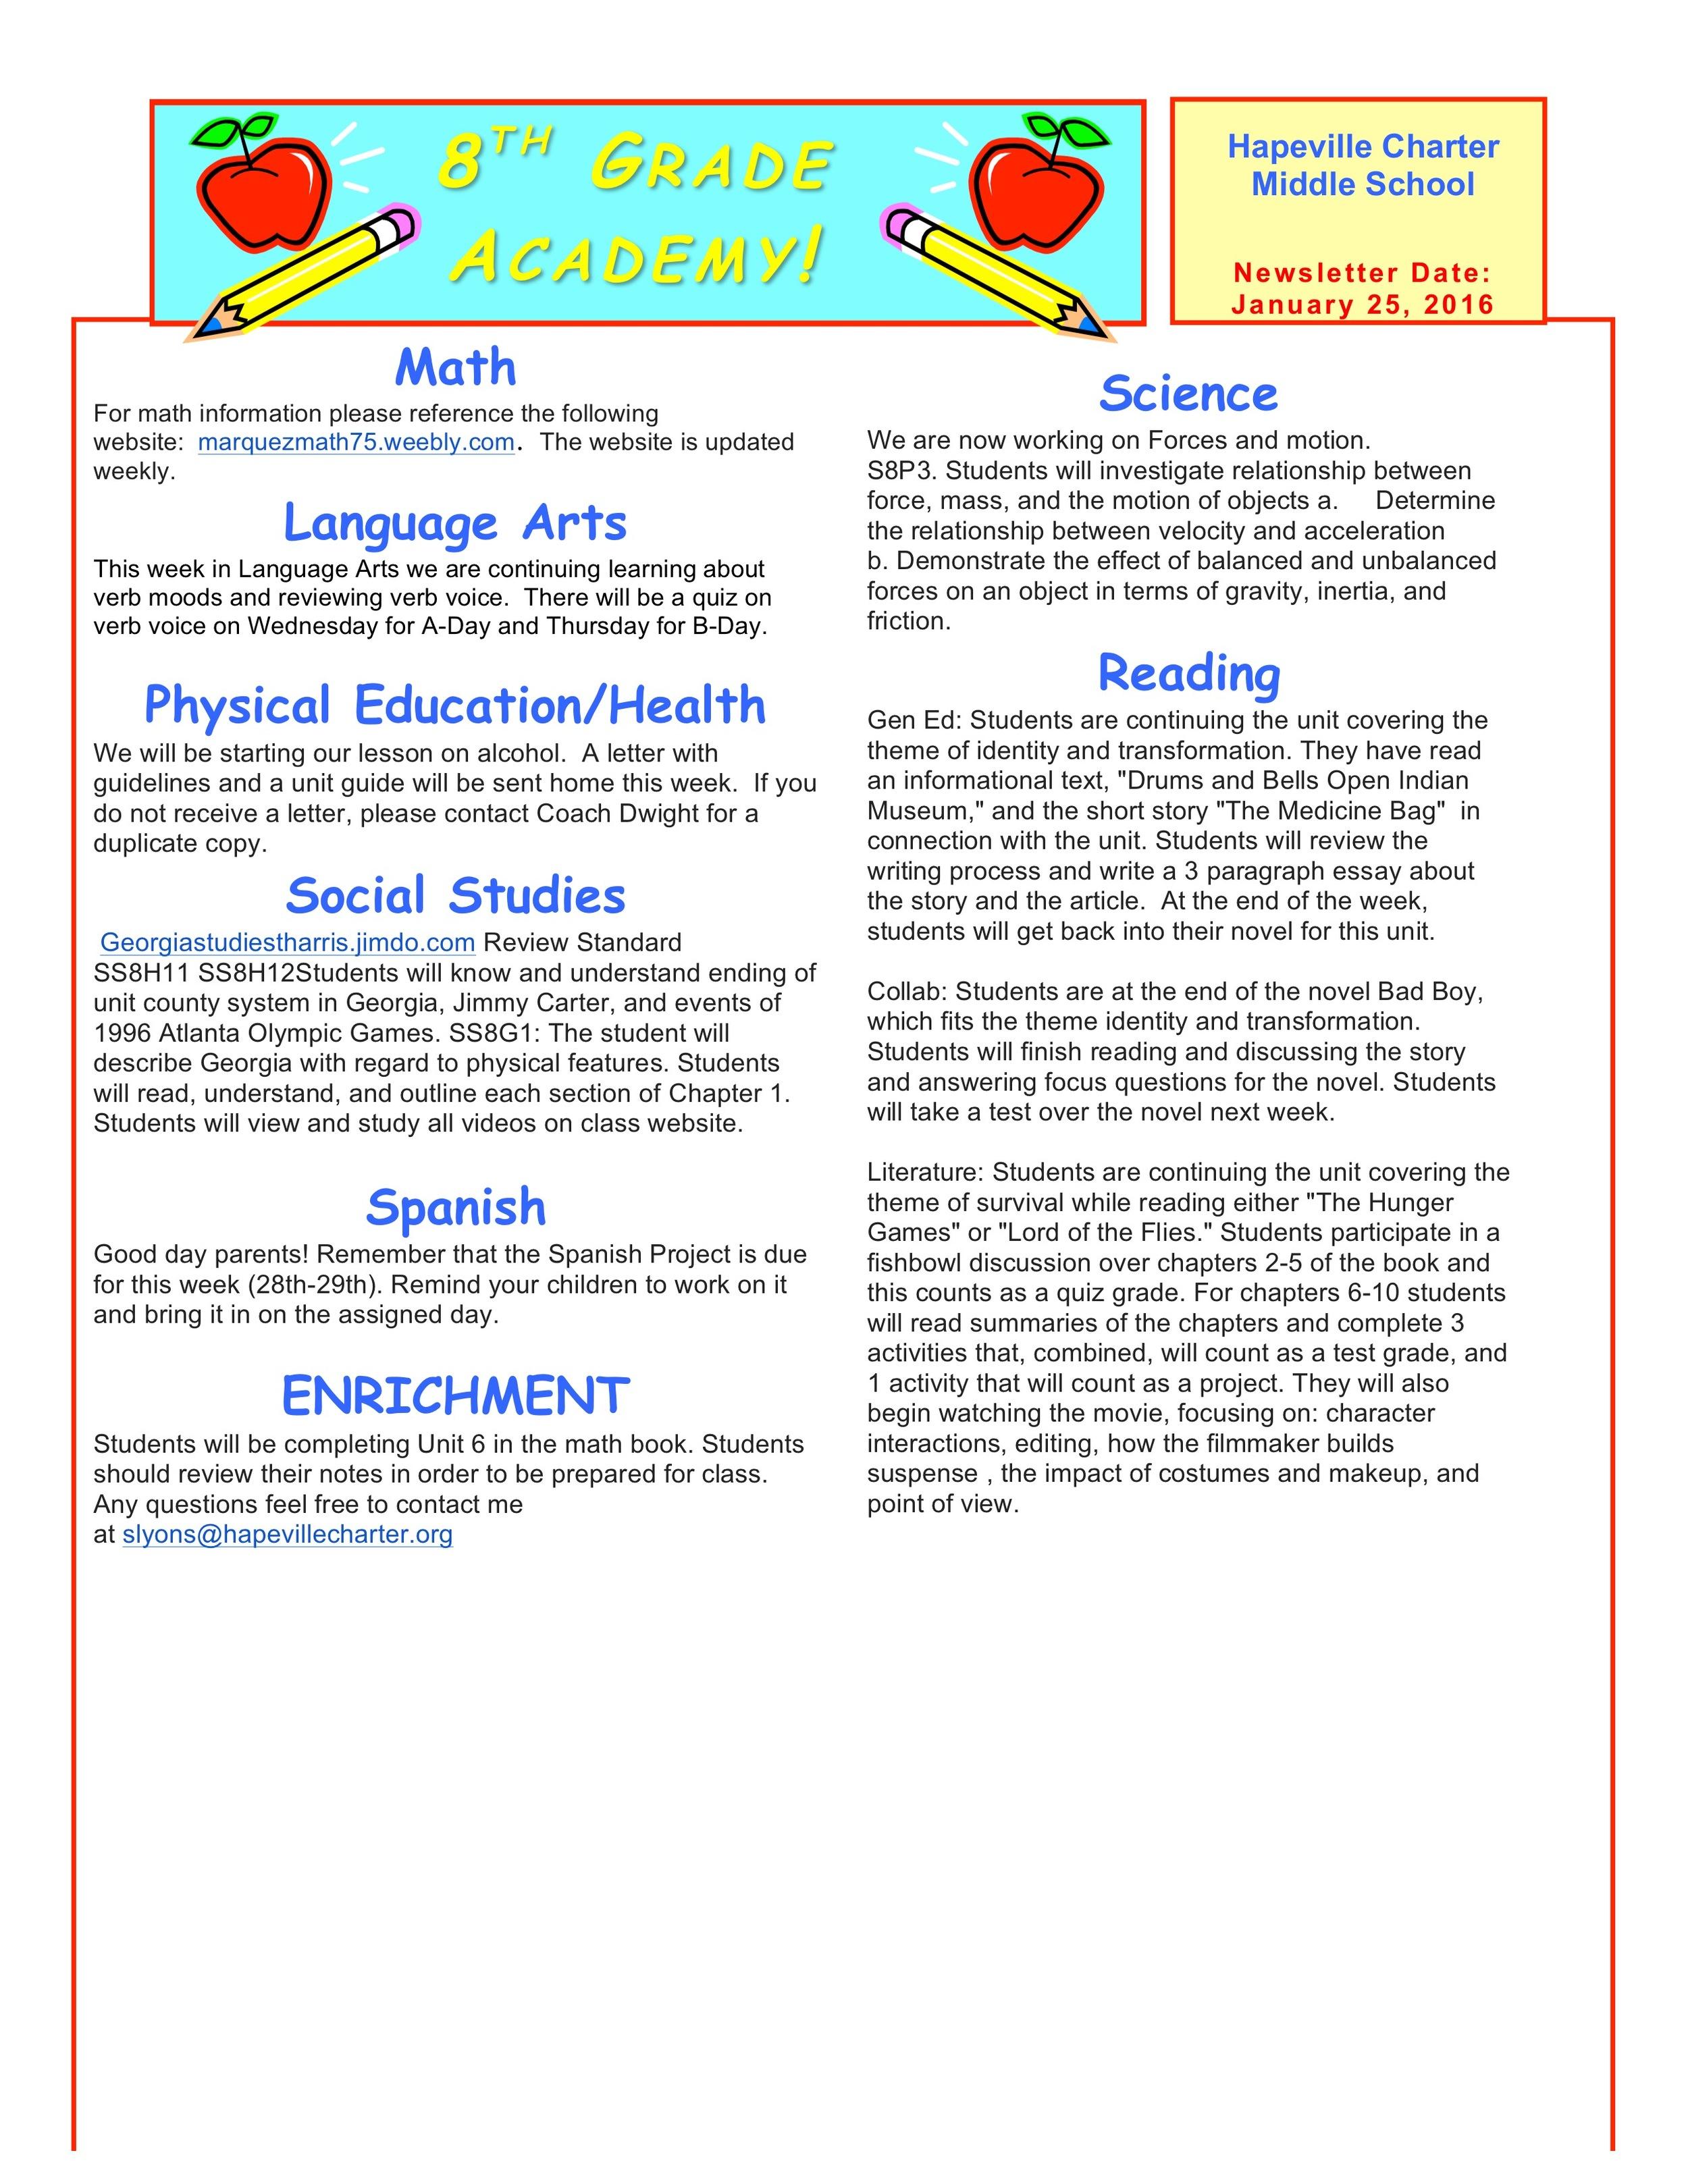 Newsletter Image8th January 25 2016.jpeg